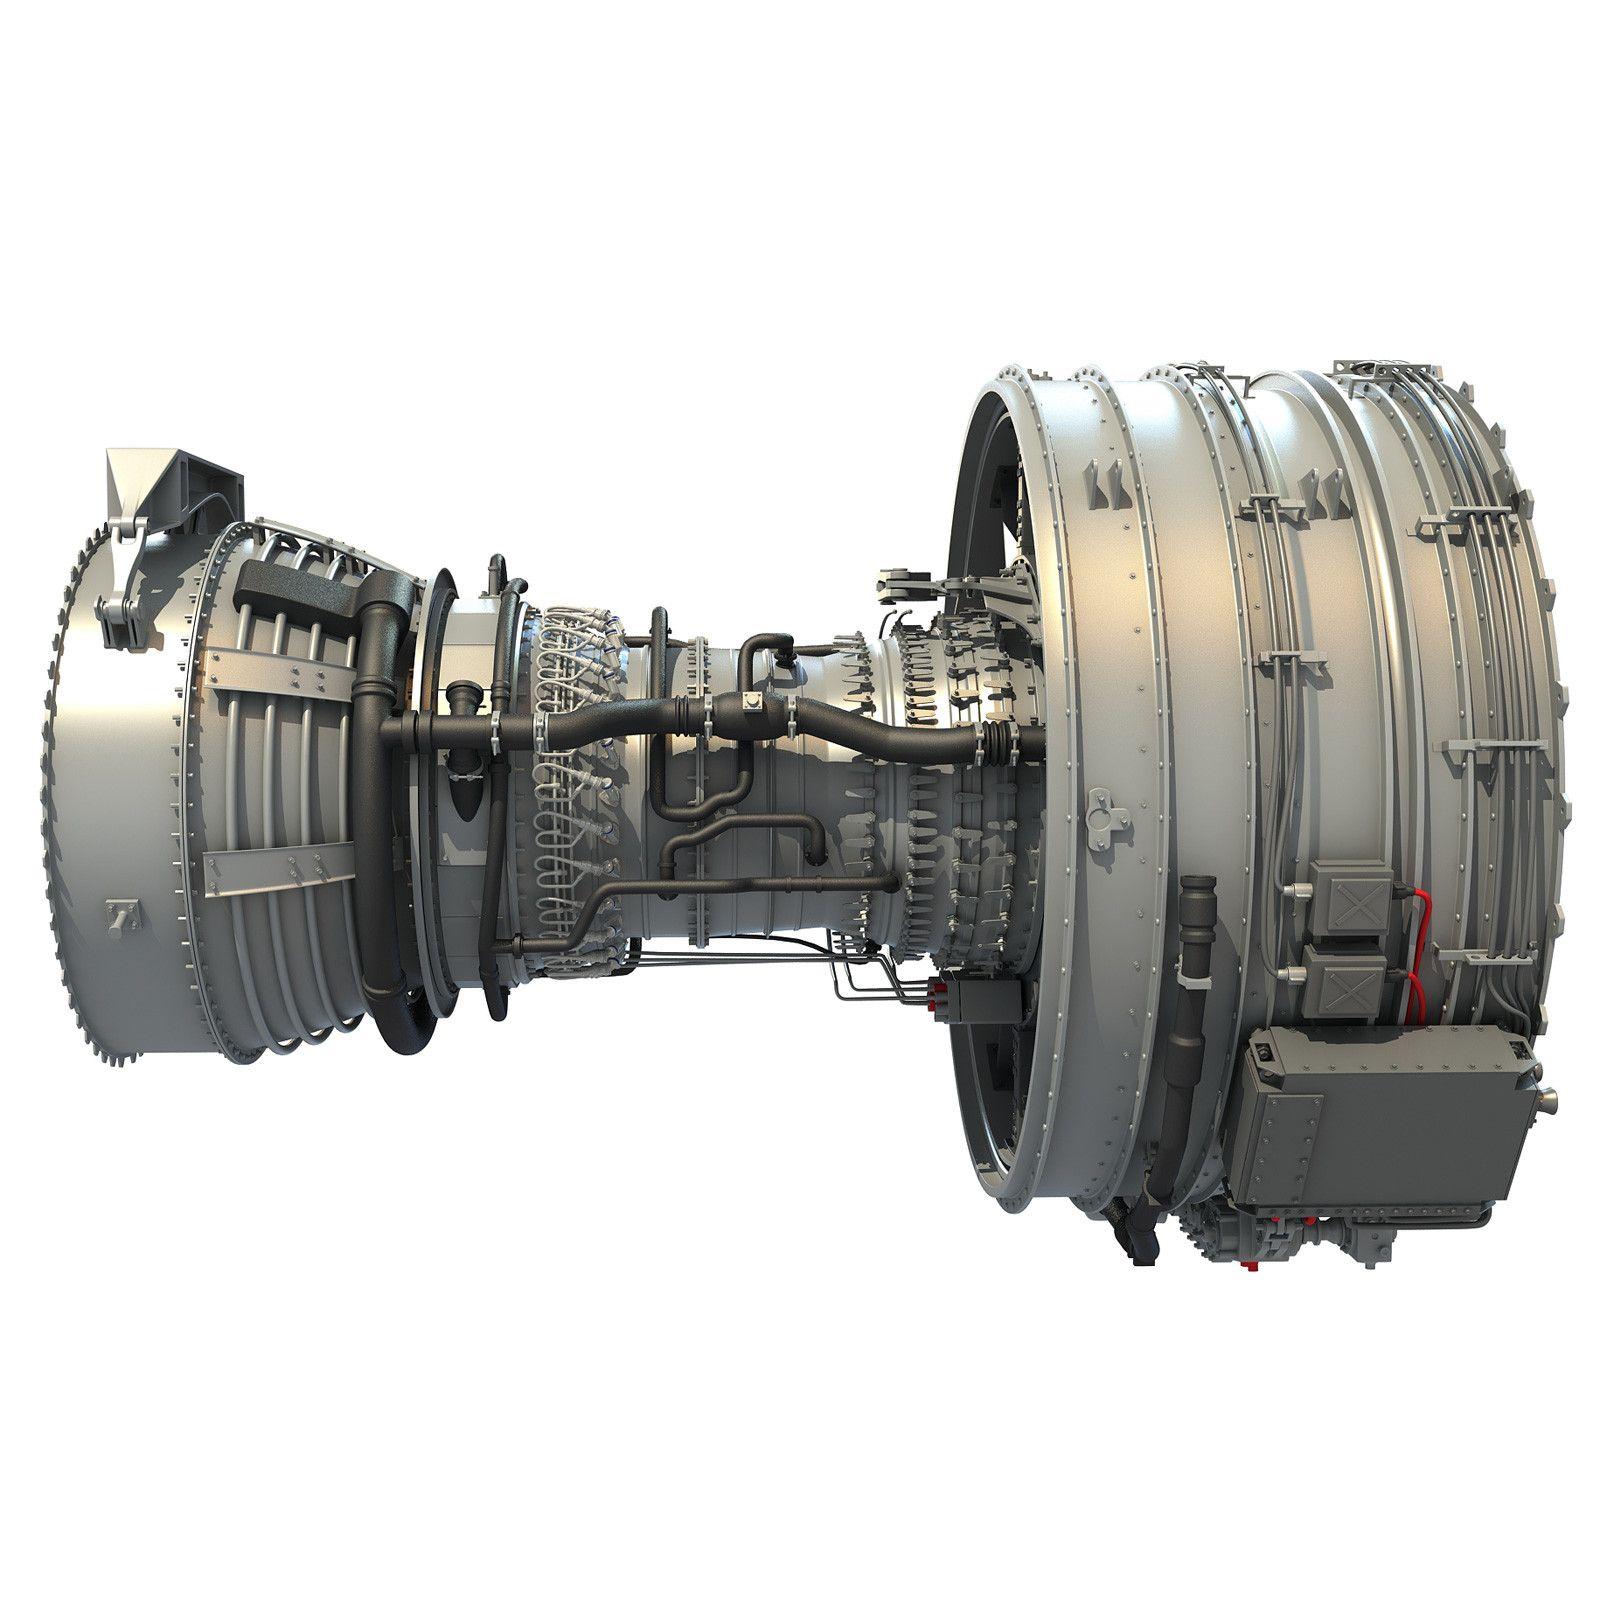 CFM International CFM56 Turbofan Aircraft Jet Engine